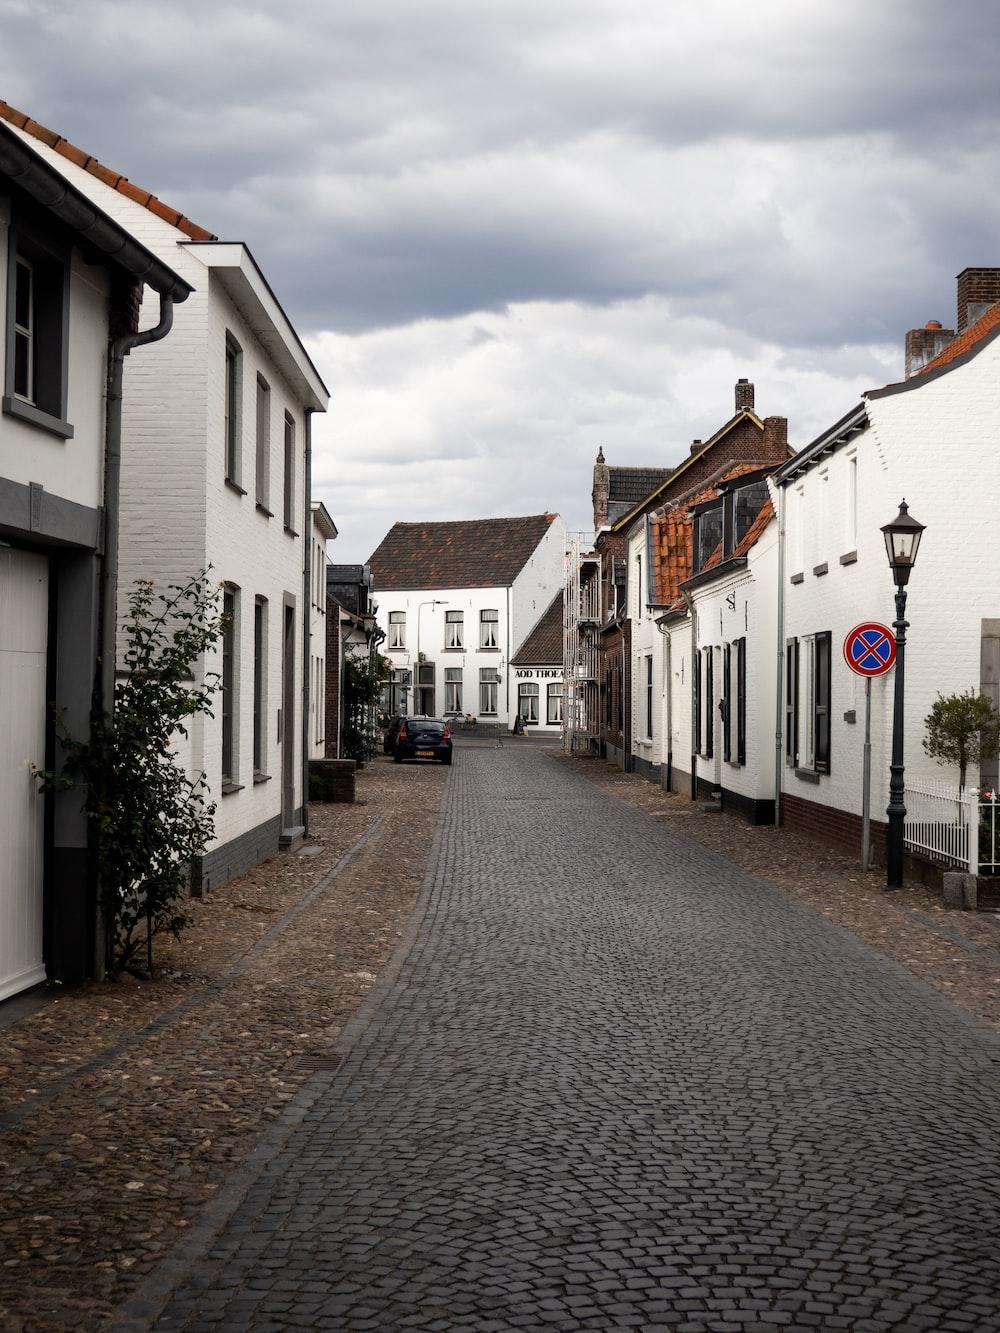 gray concrete road between houses